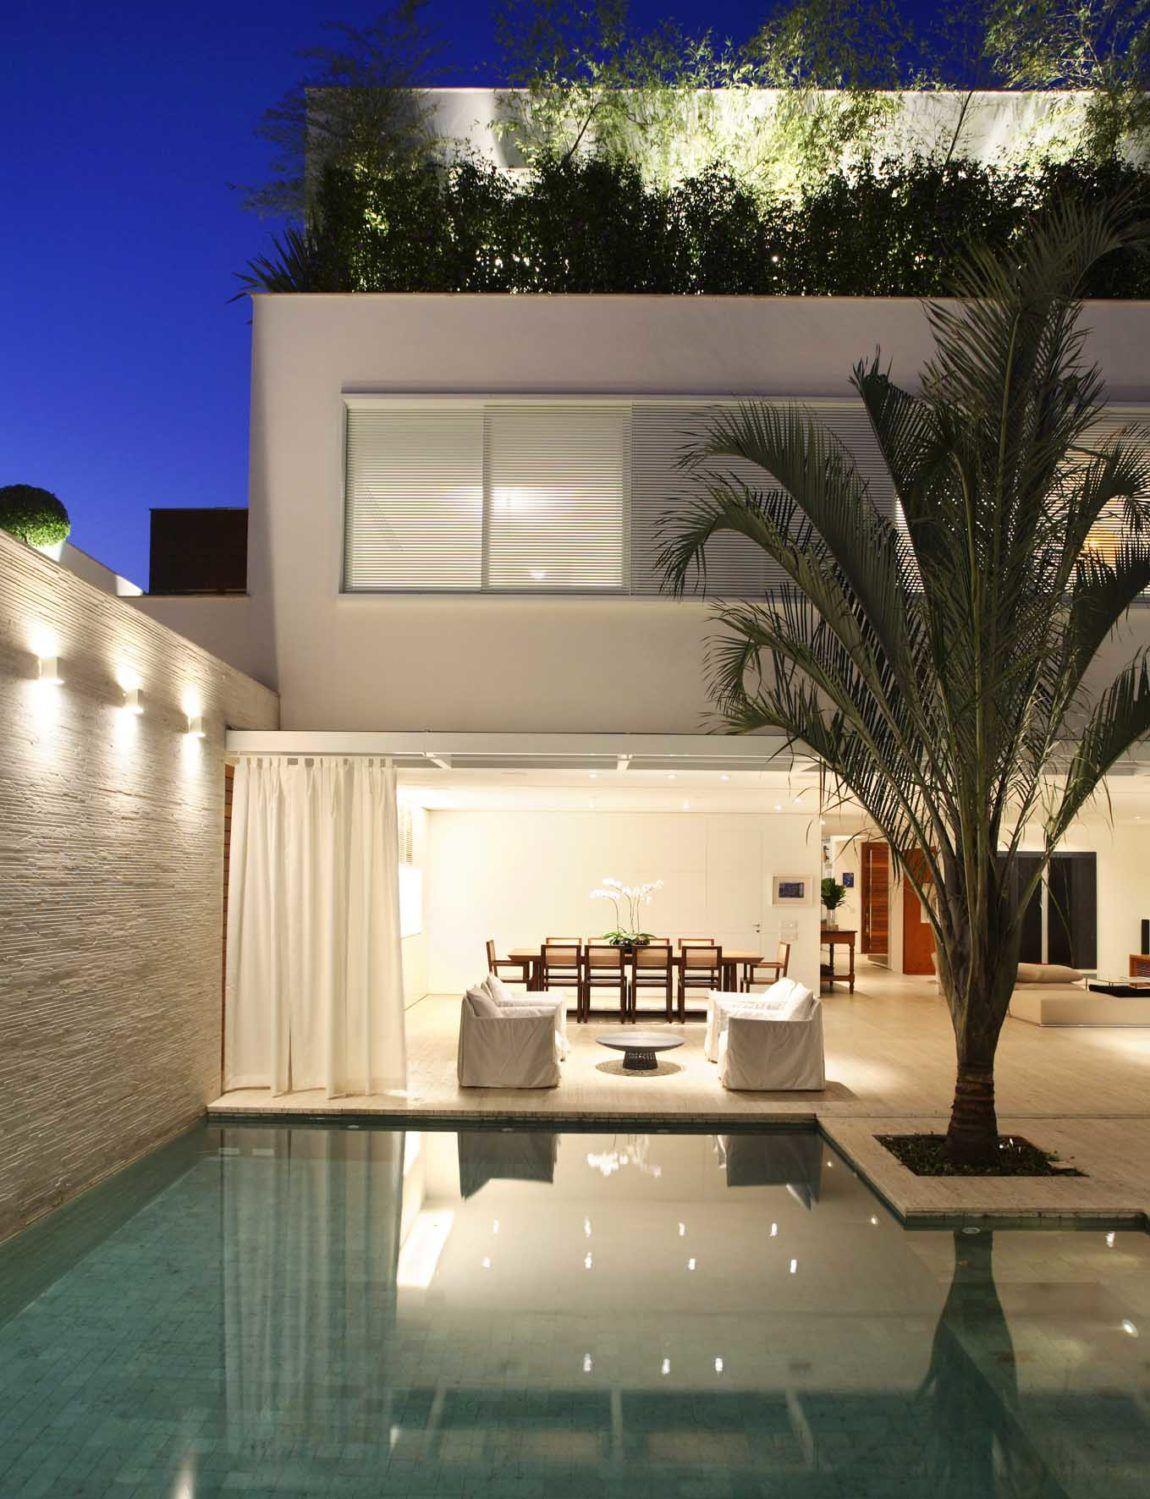 Leblon house by progetto architetura  interiores outdoor living flat roof design facade also redo are rh pinterest